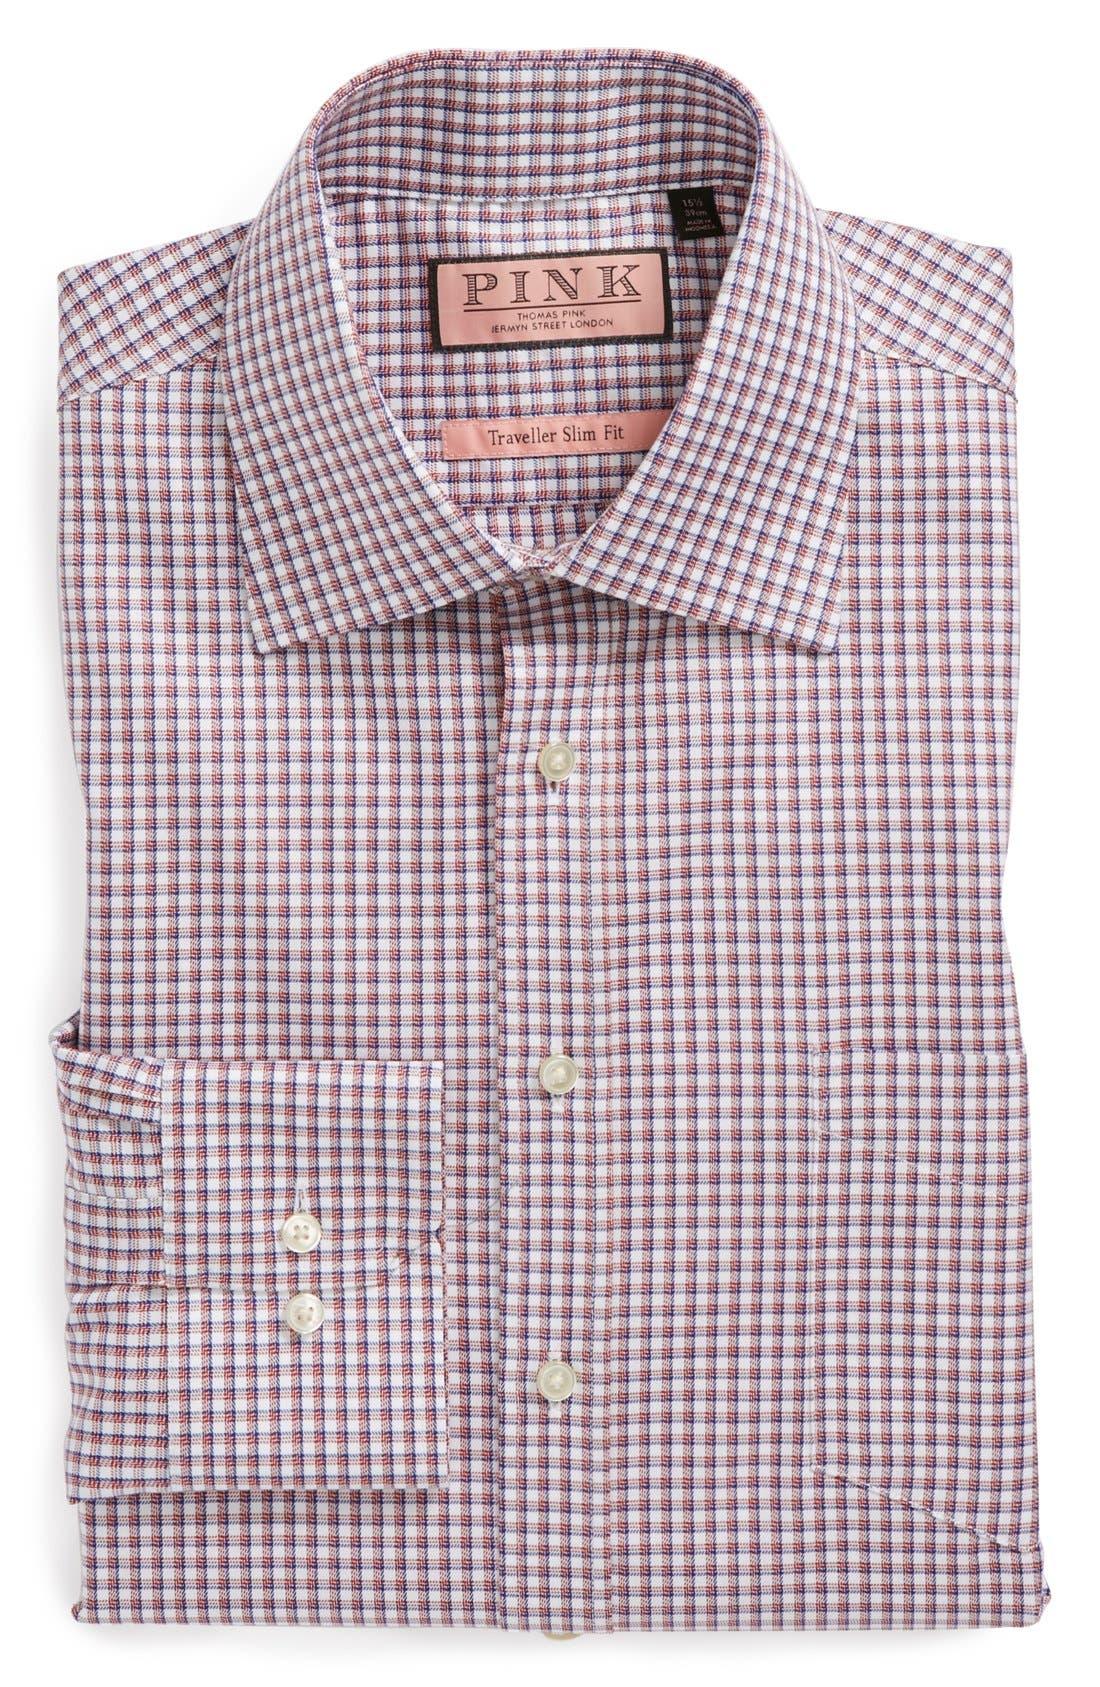 Main Image - Thomas Pink 'Cantwell' Slim Fit Traveler Check Non-Iron Dress Shirt